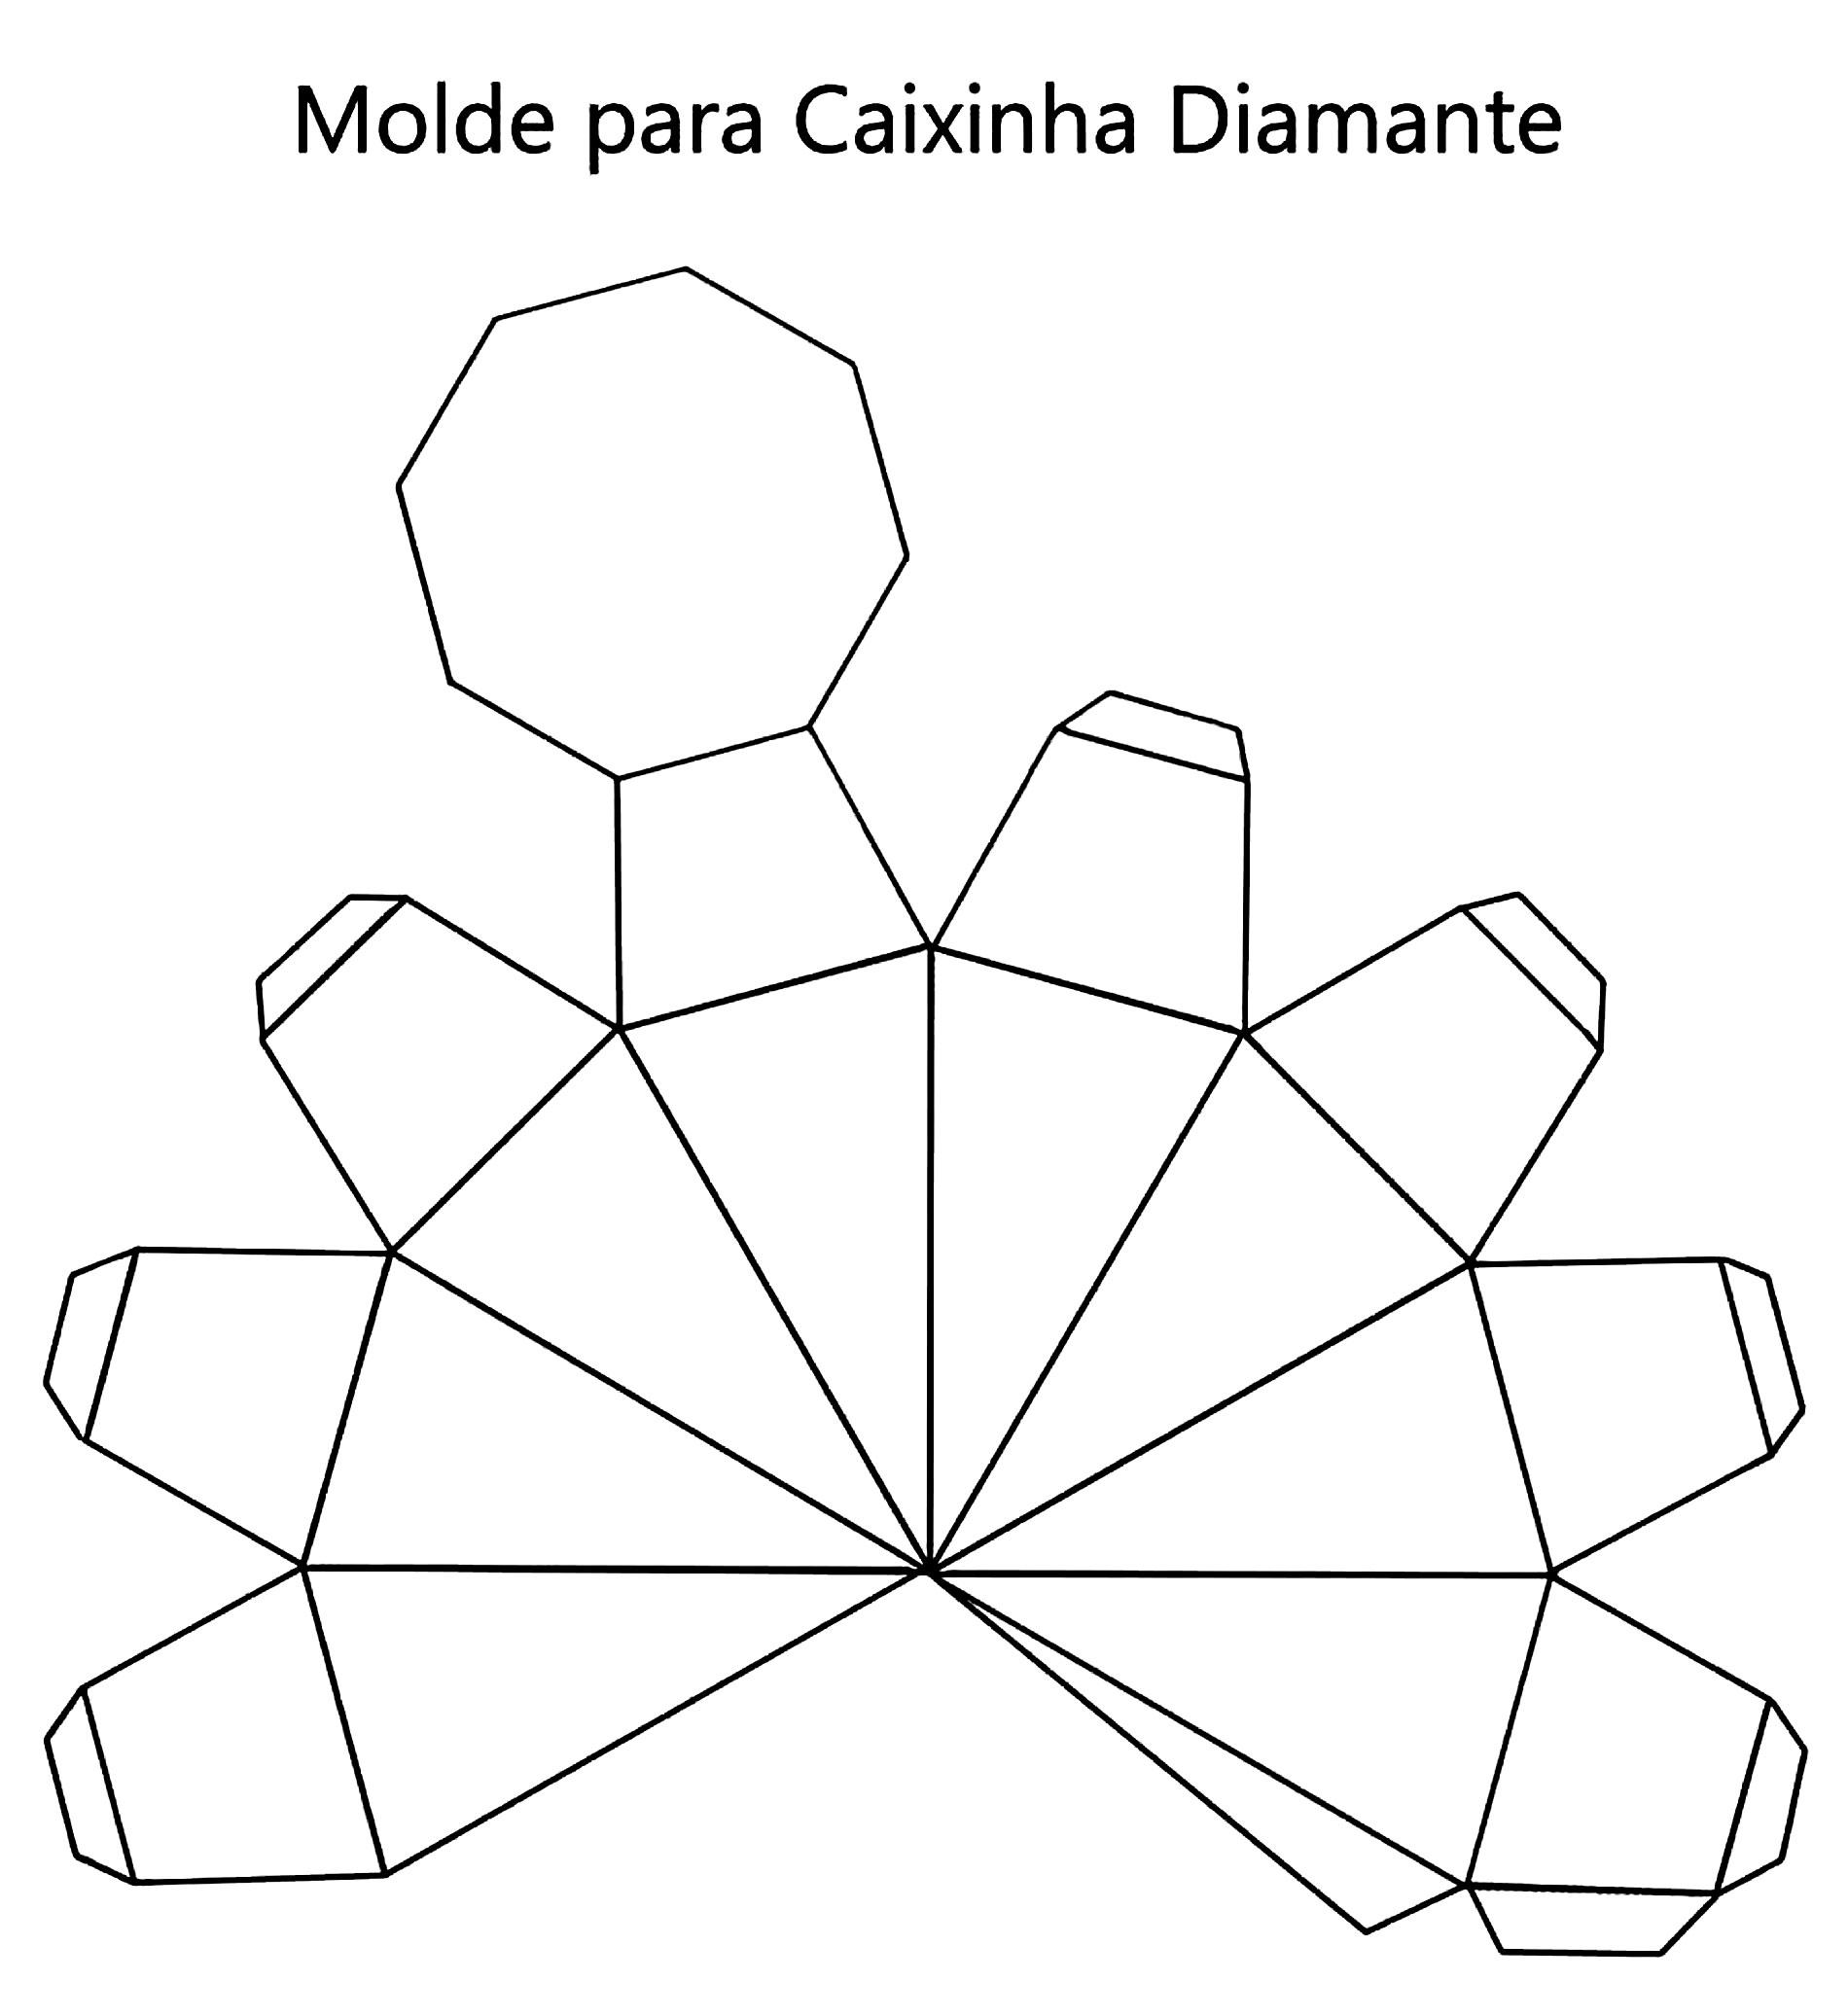 Molde para caixinha diamante